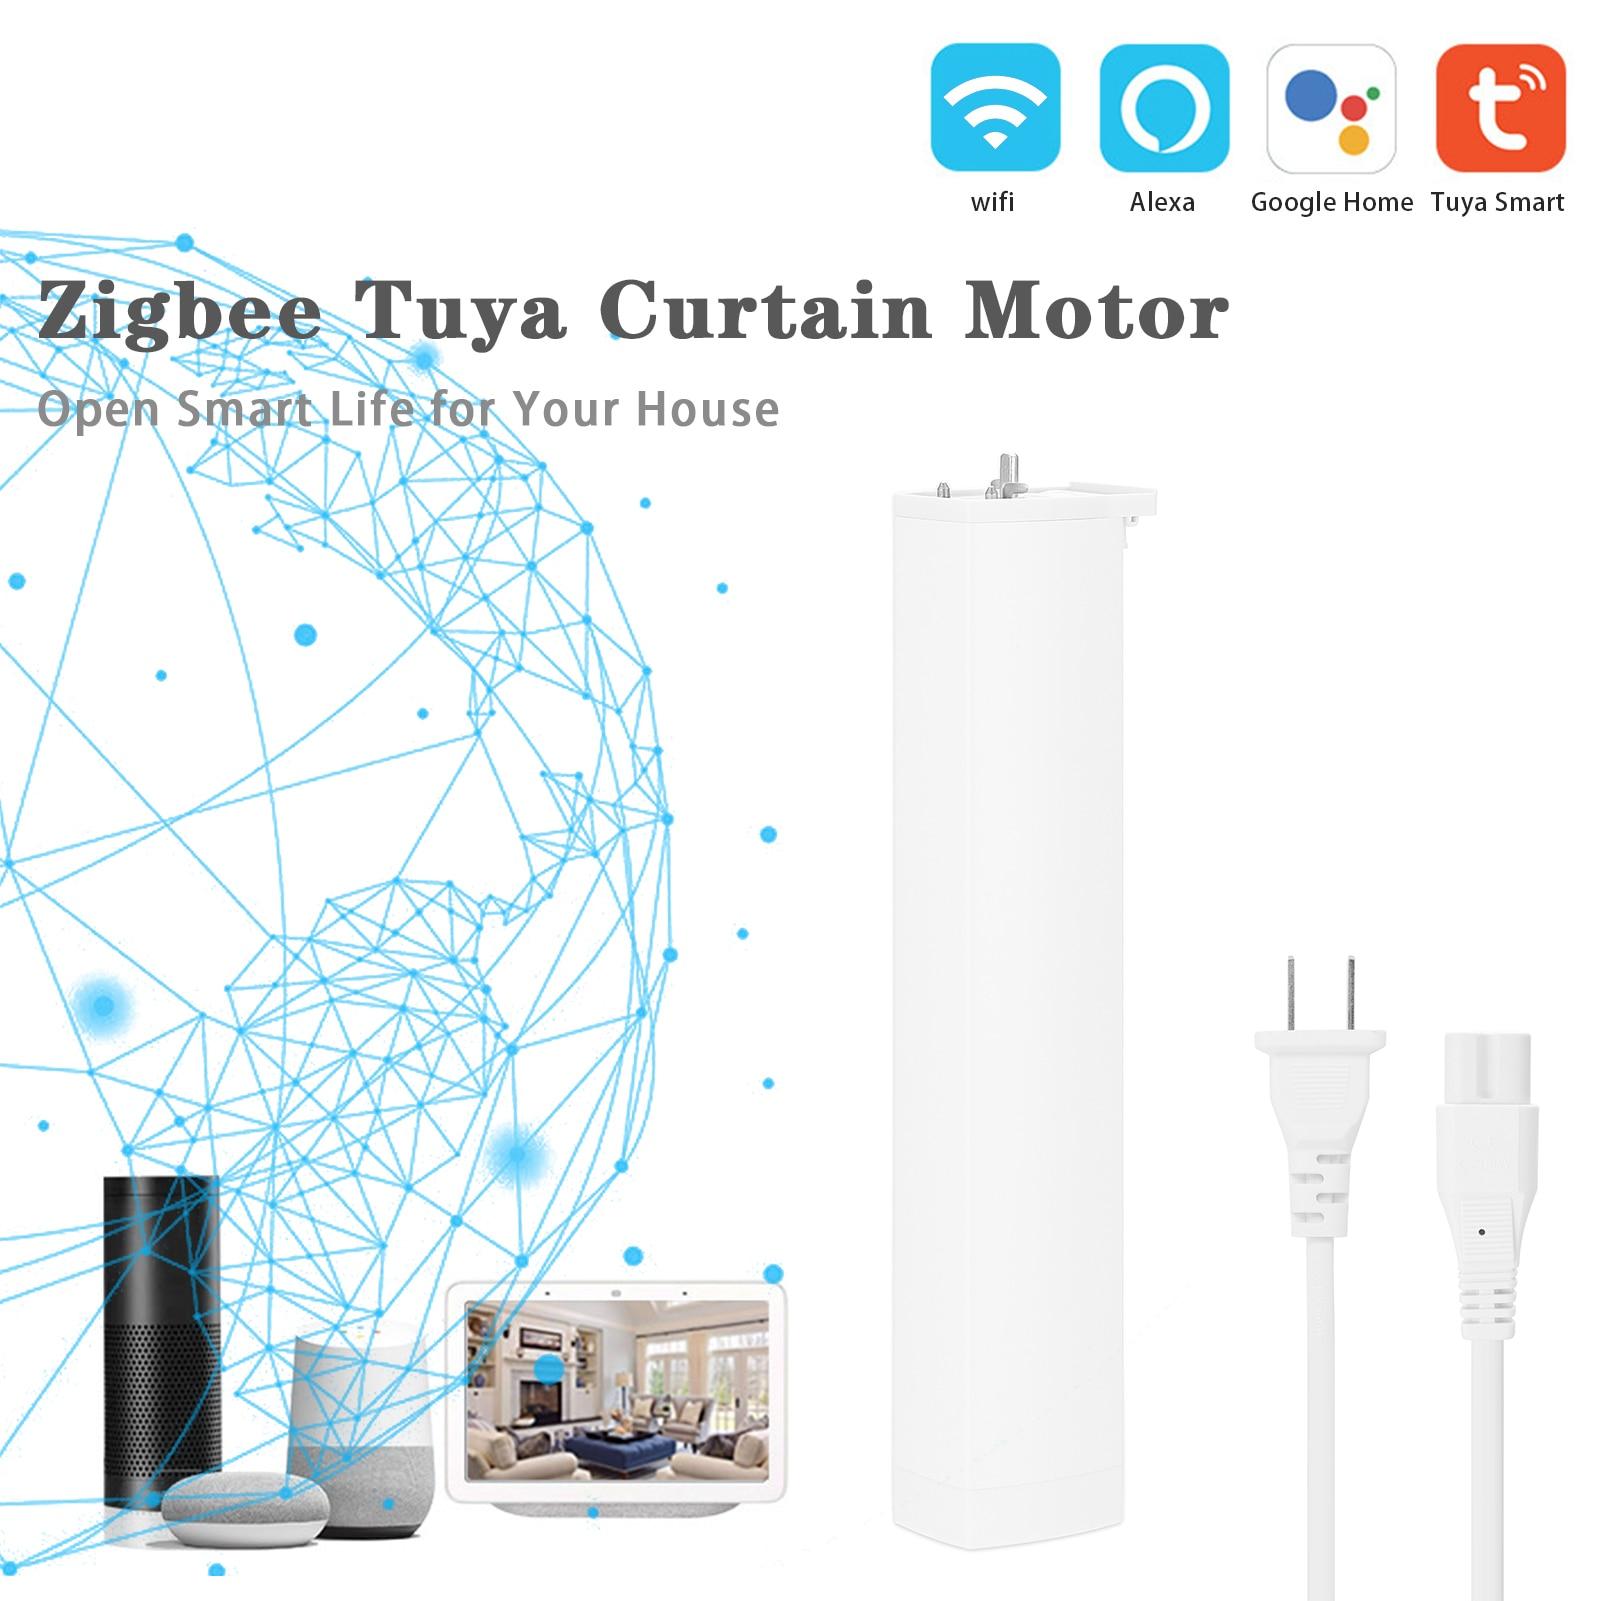 Tuya-مفتاح تحكم ذكي للستائر الآلية ، ومفتاح تحكم في مصراع الأسطوانة ، وواي فاي ، متوافق مع Alexa و Google